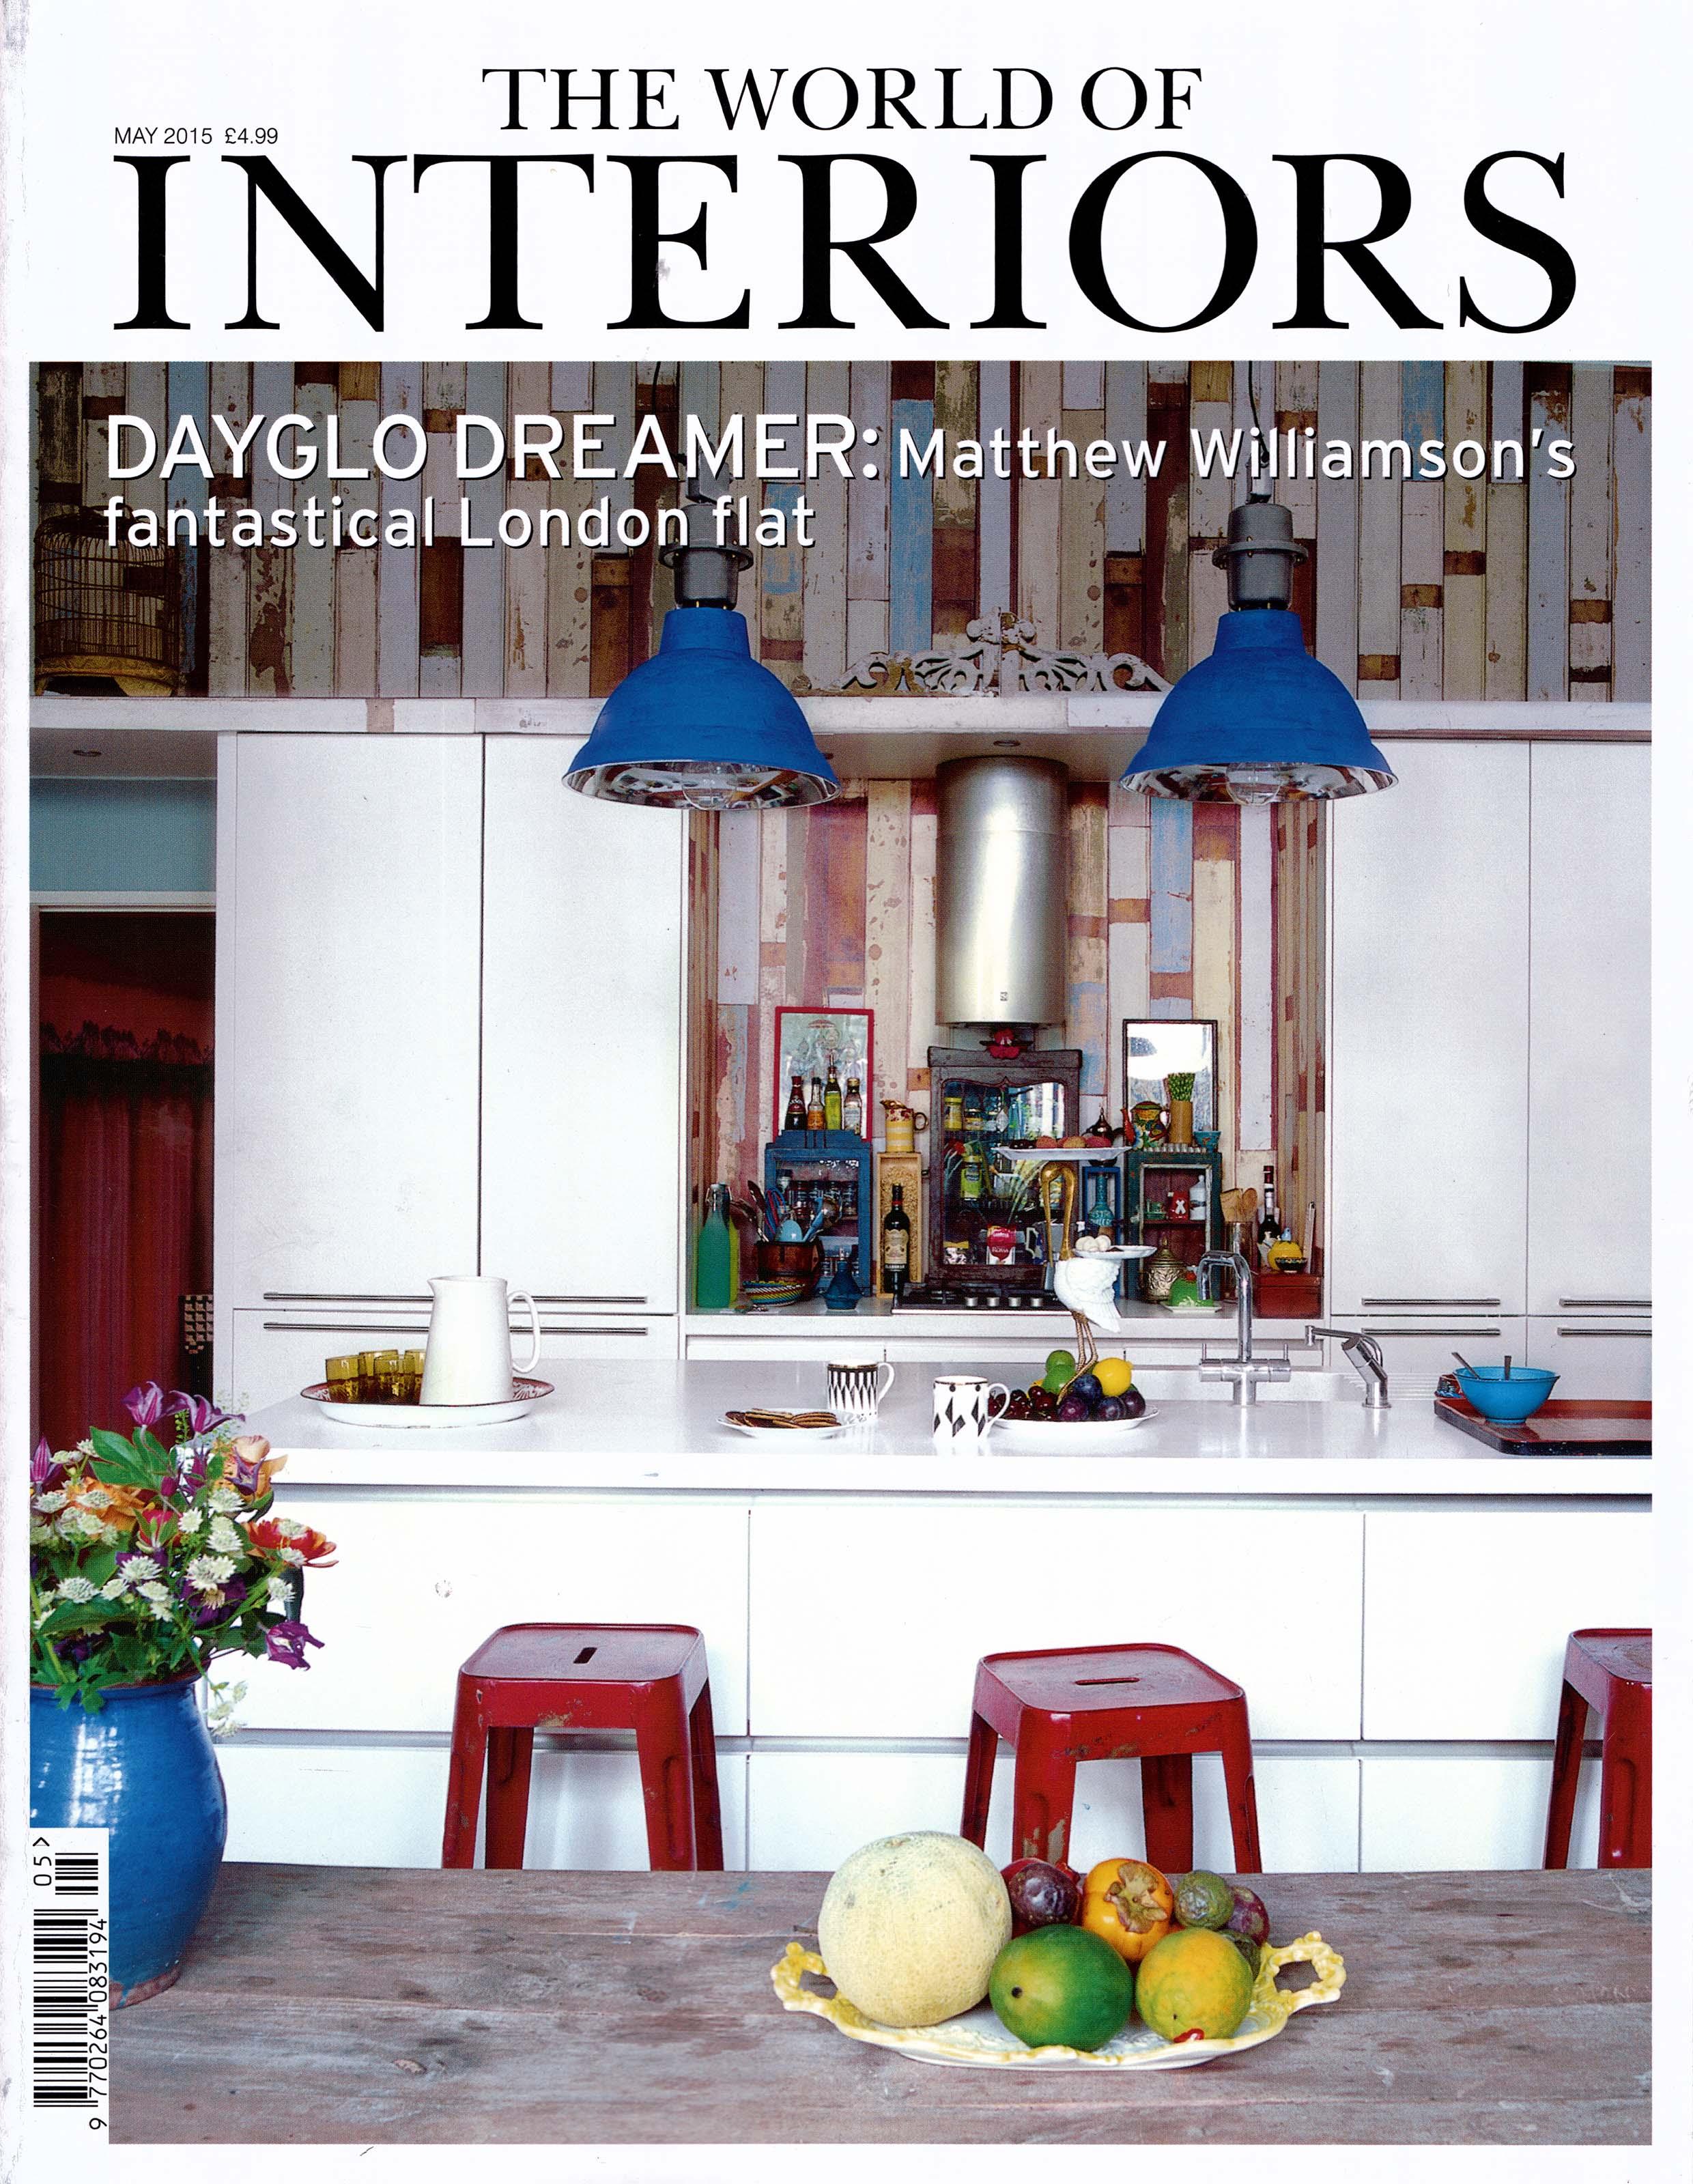 World of Interiors concrete sinks Tim Sprules.jpg